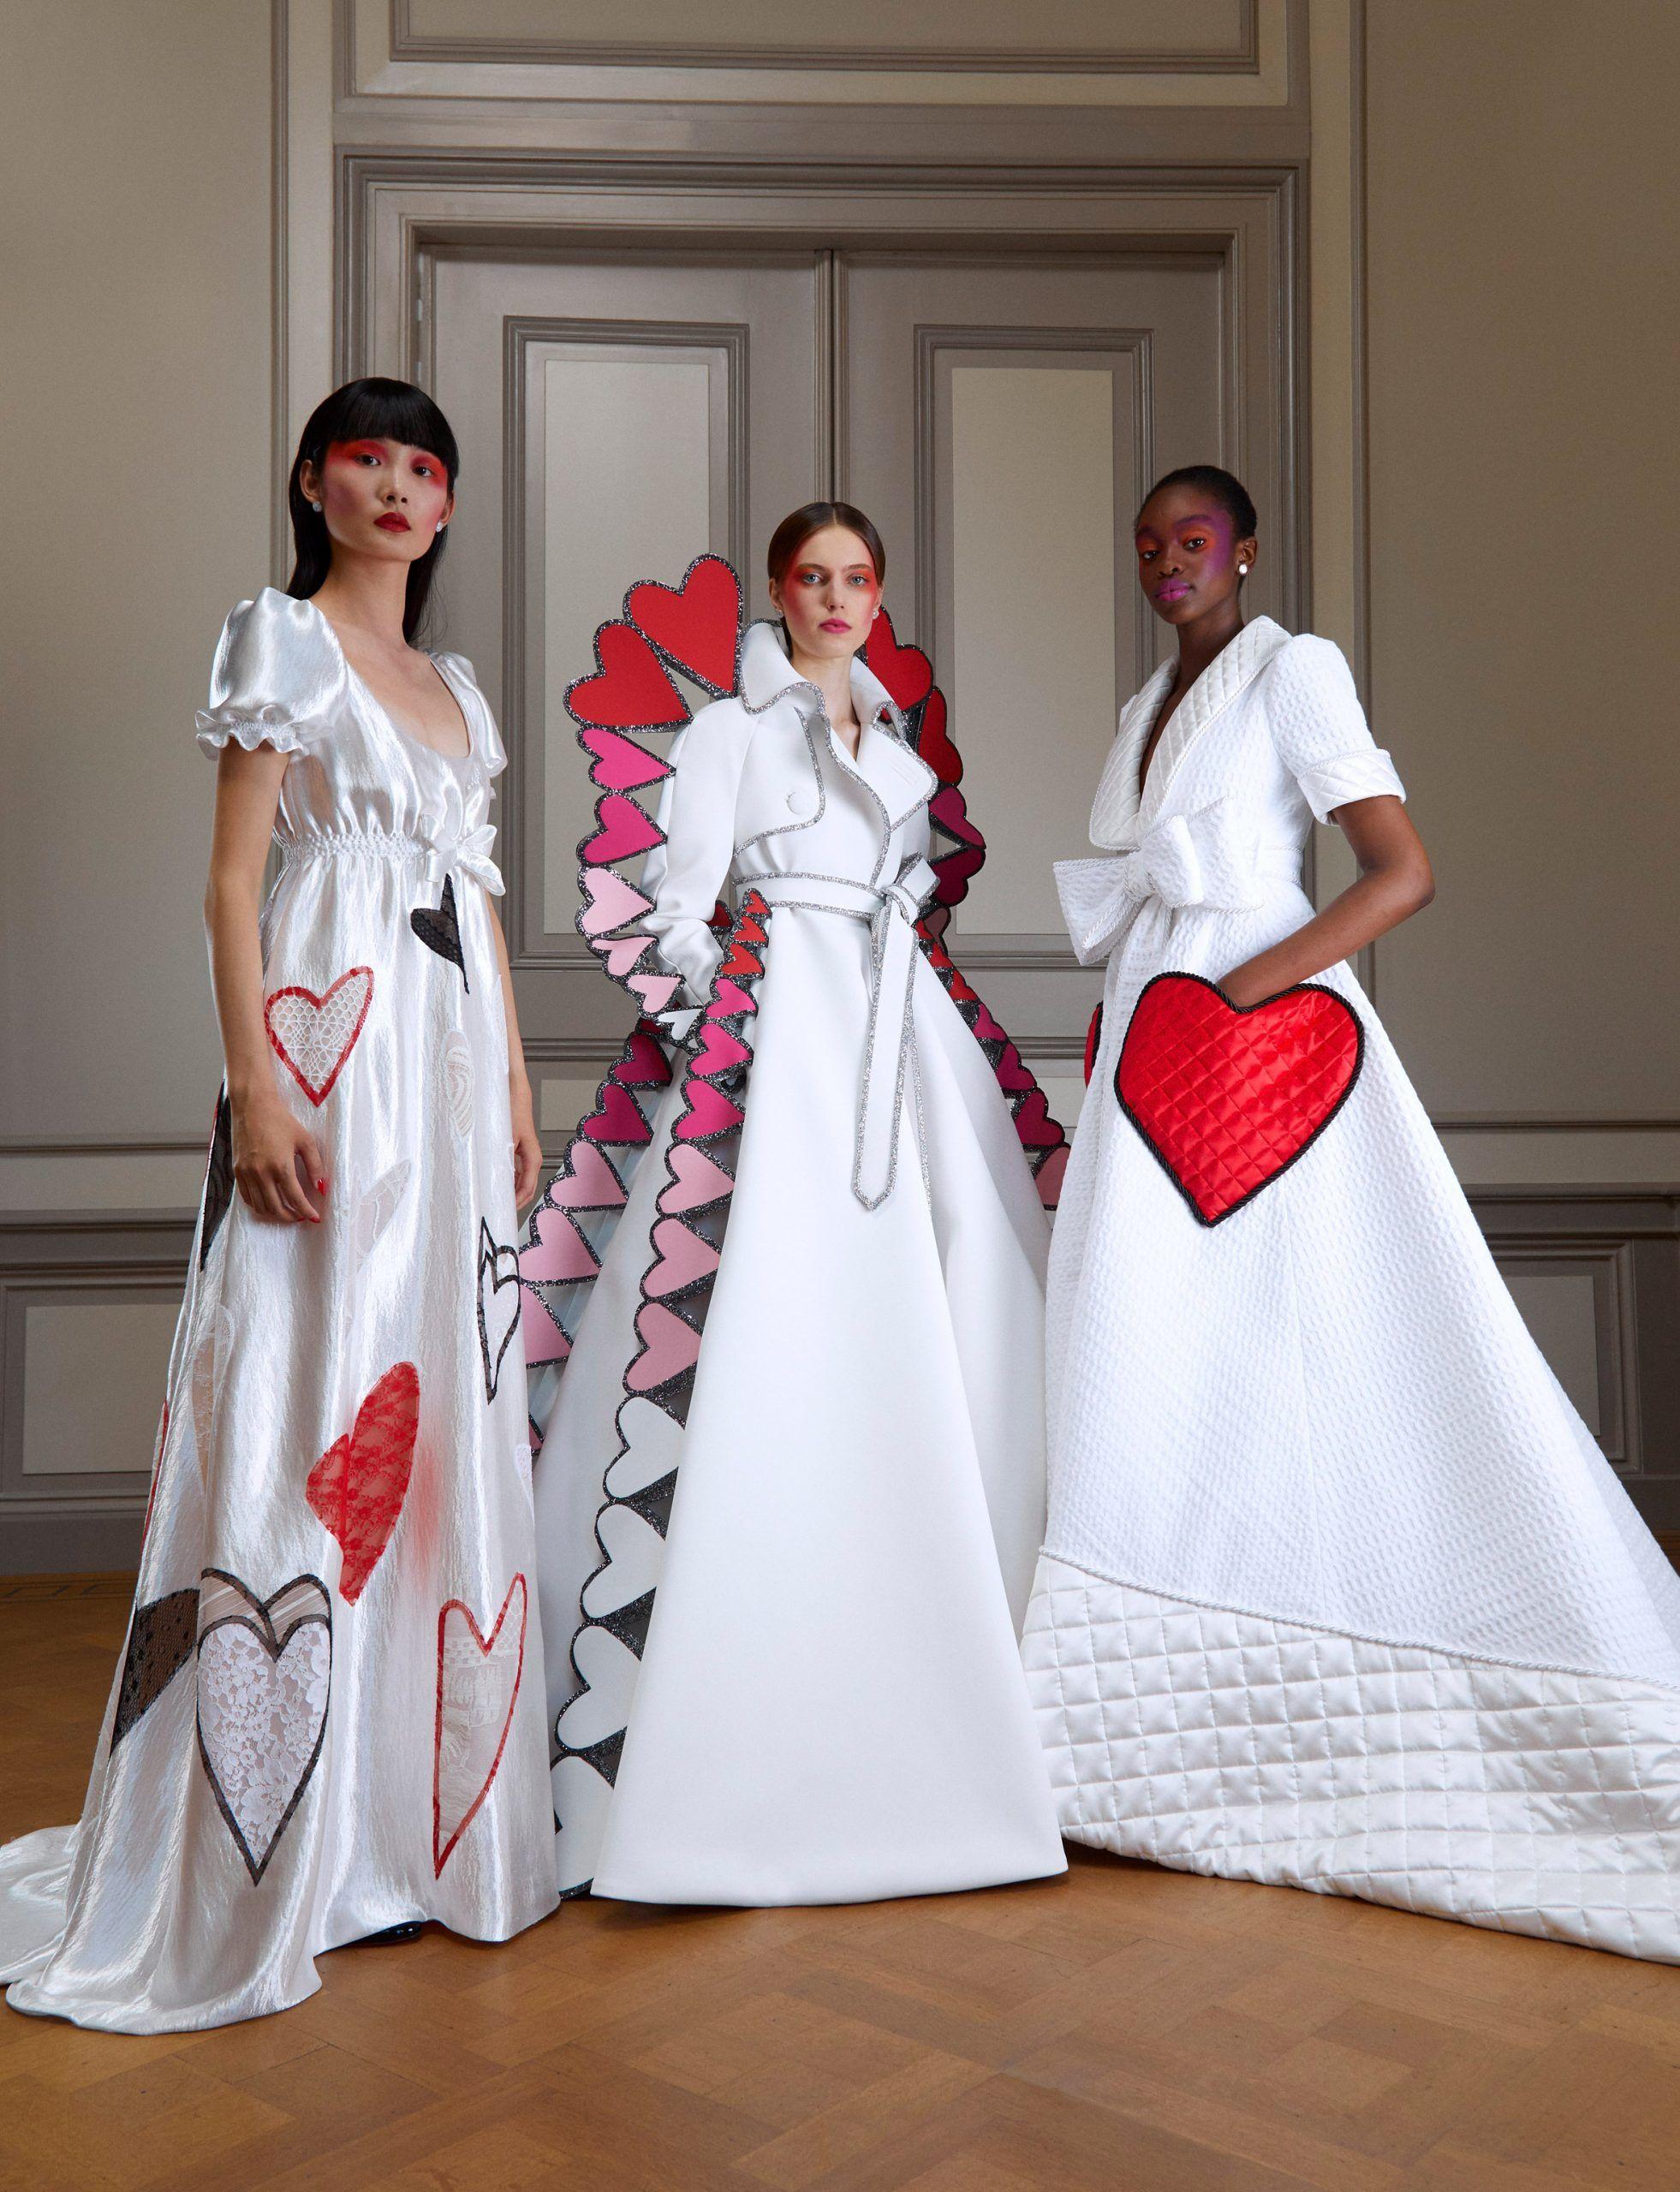 Viktor&Rolf宣传与Covid19相关的最新时装系列心态 in 2020 Fashion